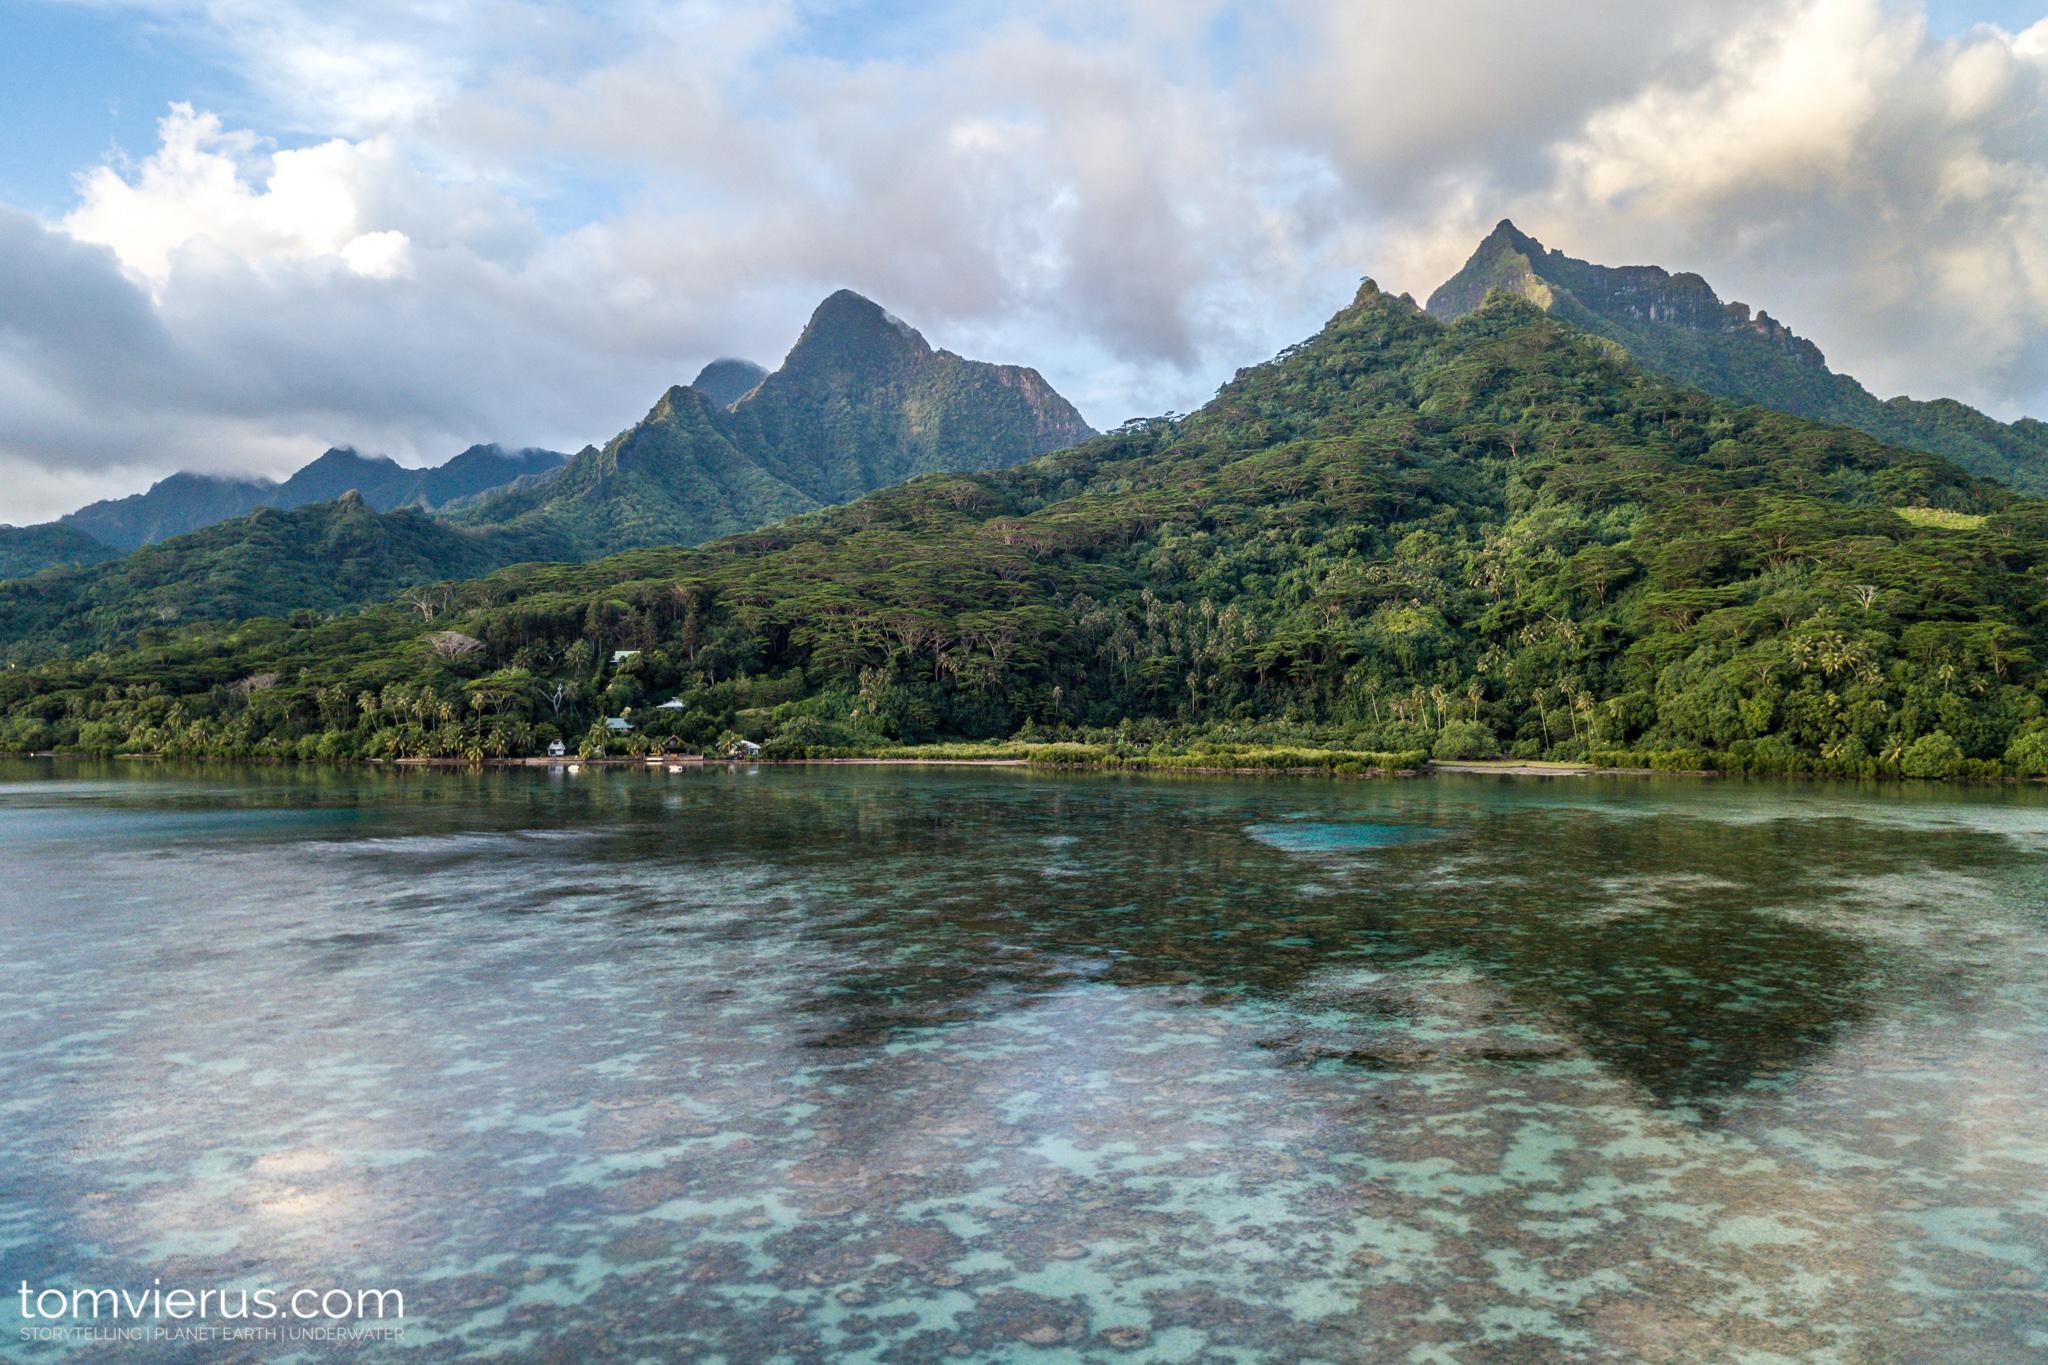 DJI Mavic Pro, Drone, Tropics, Travel